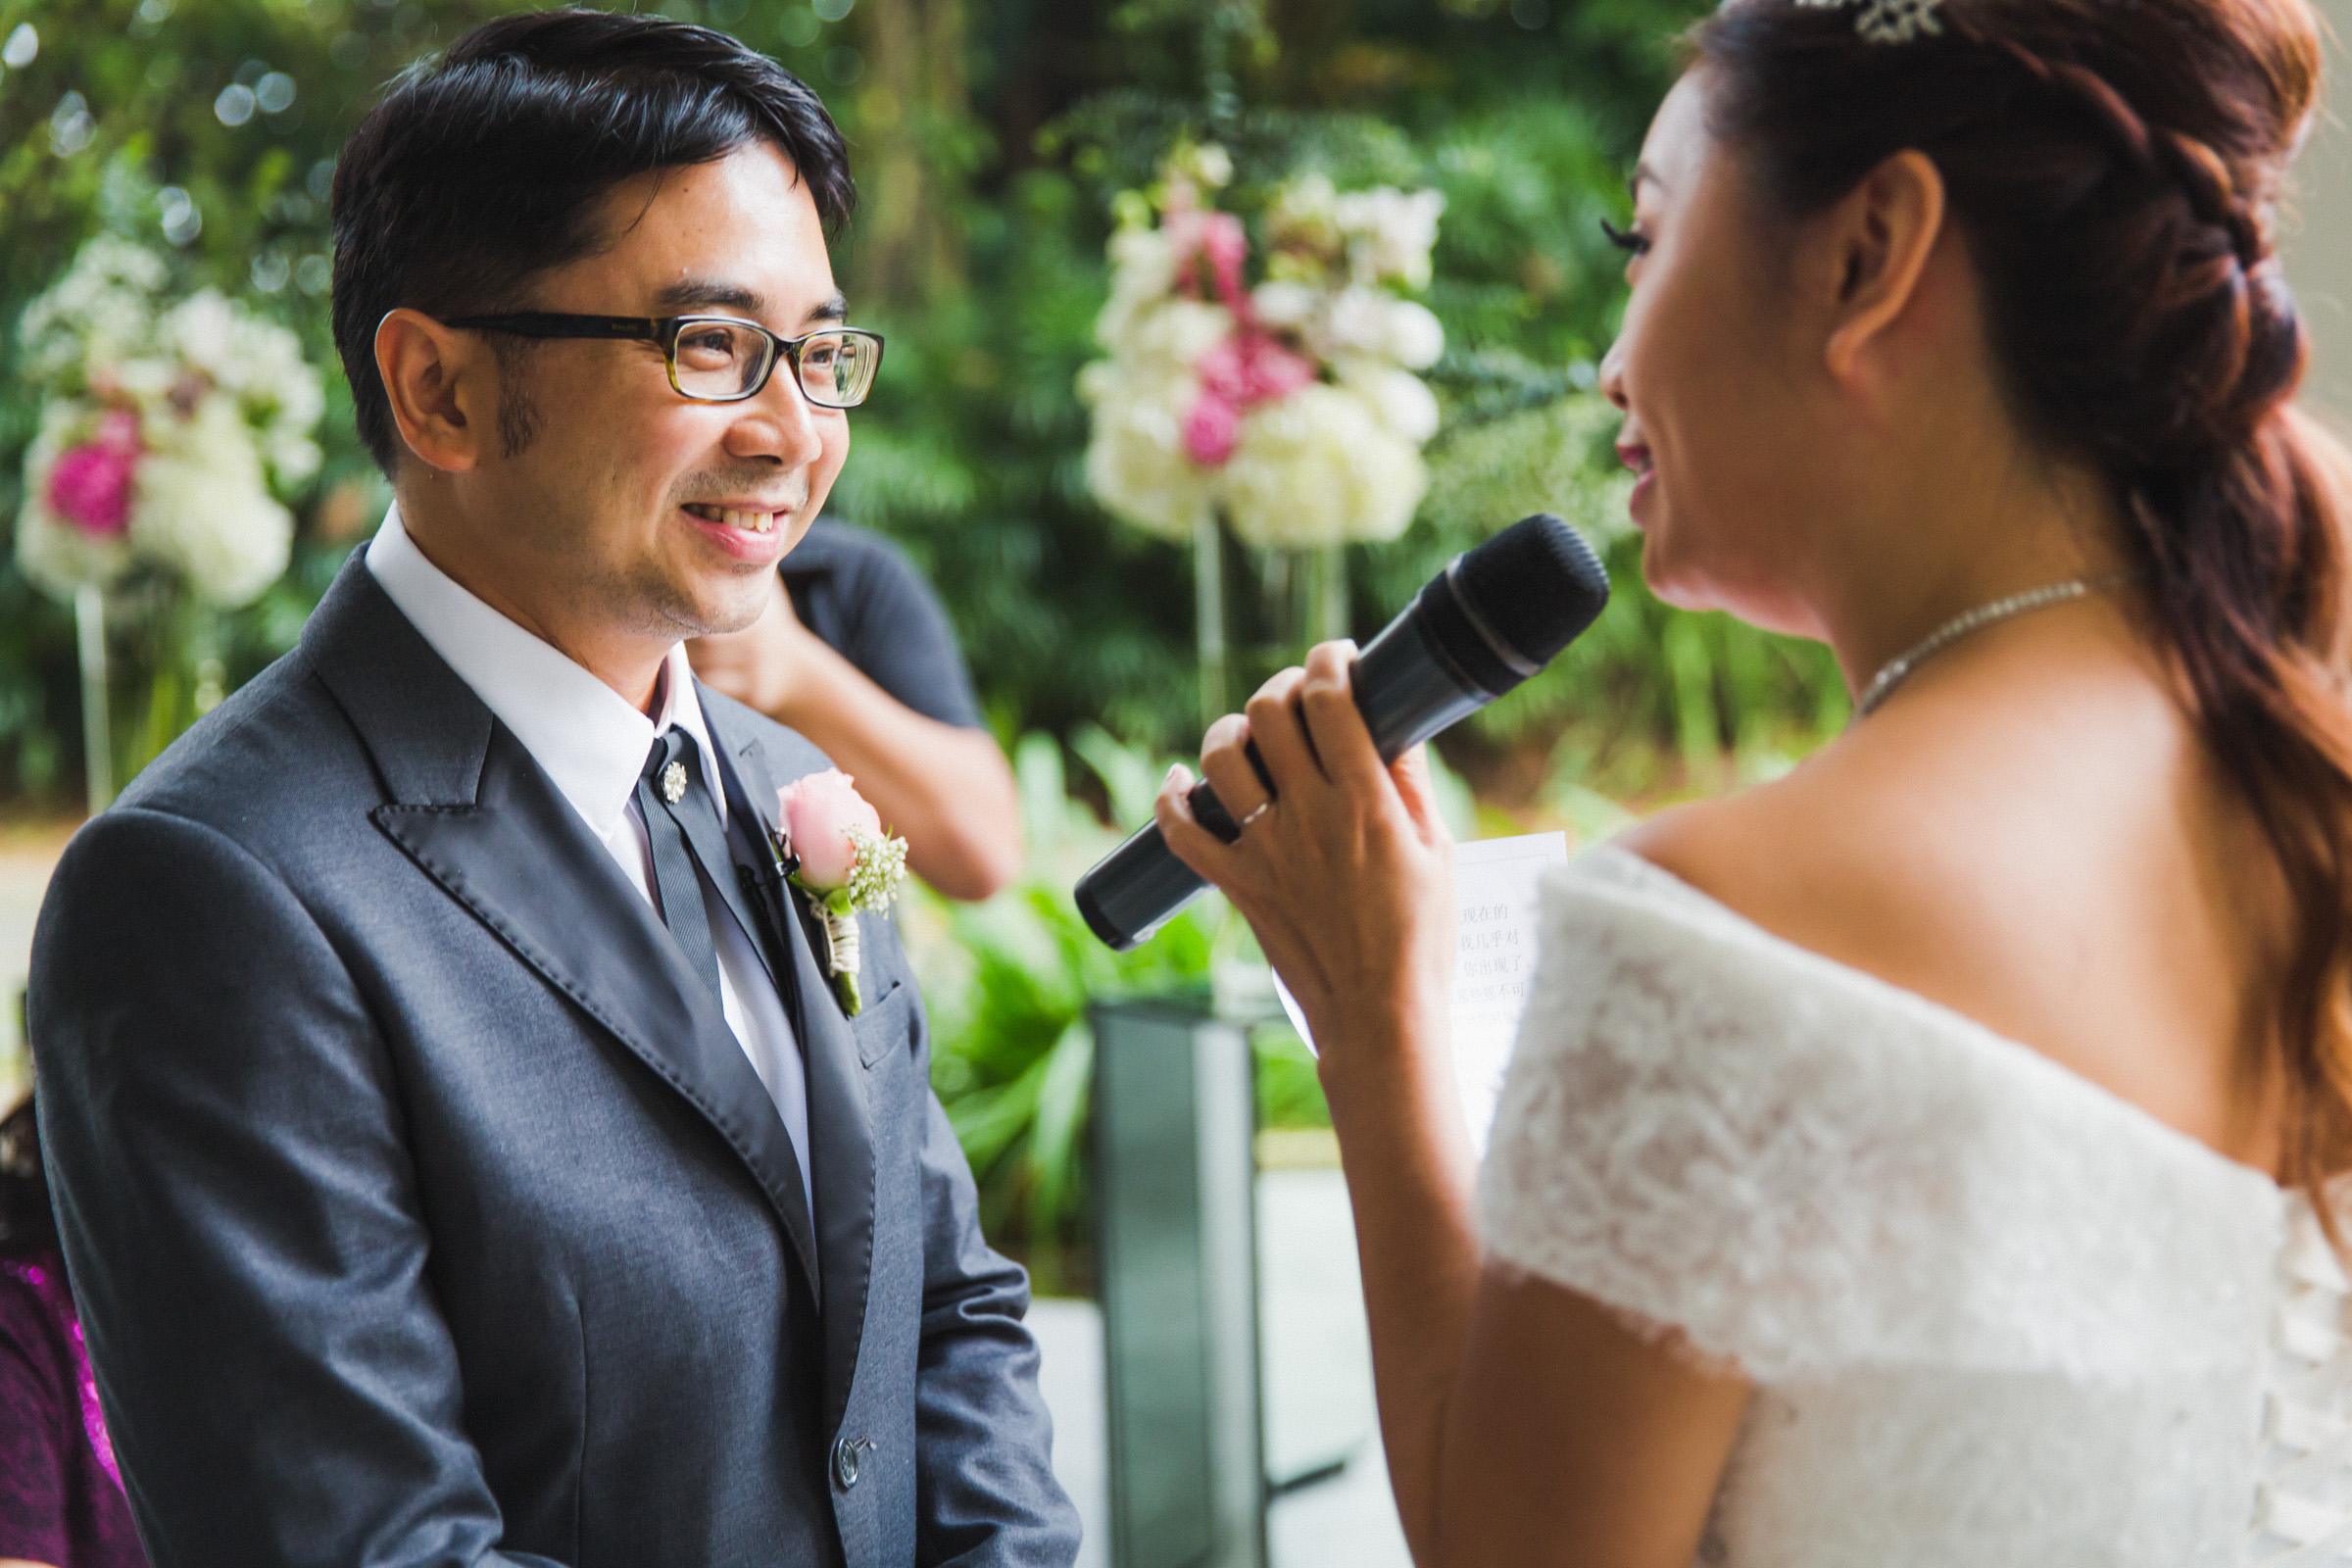 Steven_Jasmine_Wedding_Walldrobe Photography_Wedding shoots_Actual day wedding_Photographer (30)